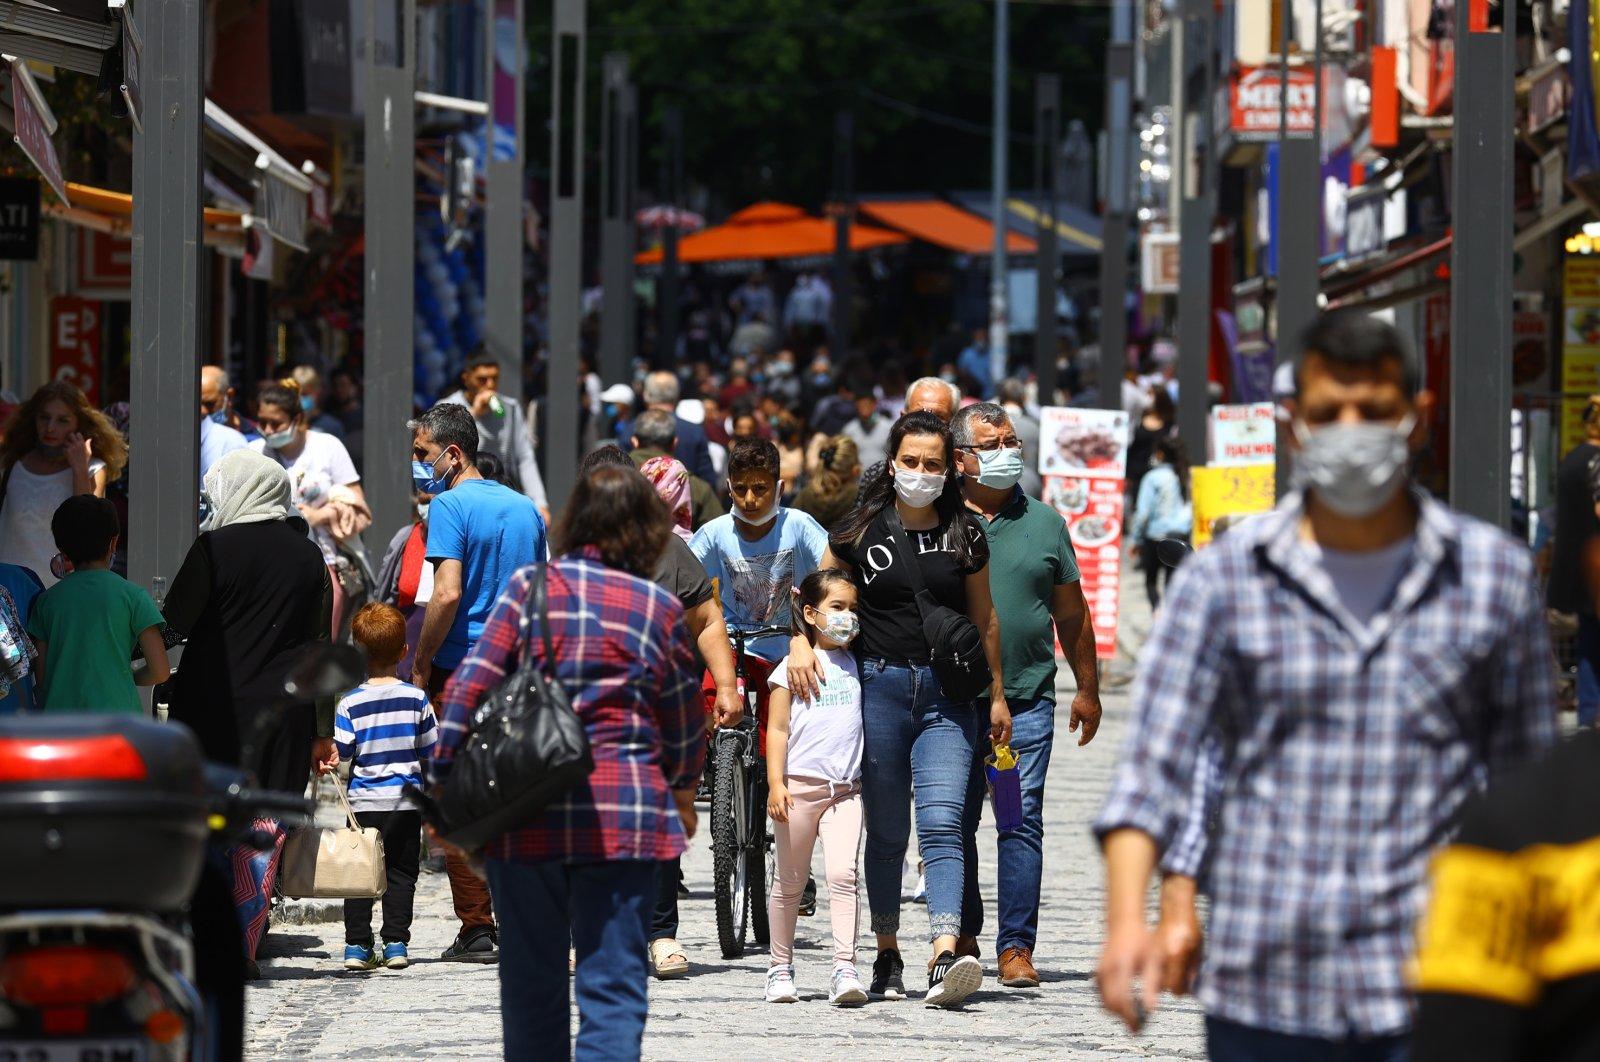 People wearing protective masks walk on a street in Edirne, northwestern Turkey, June 1, 2021. (AA Photo)